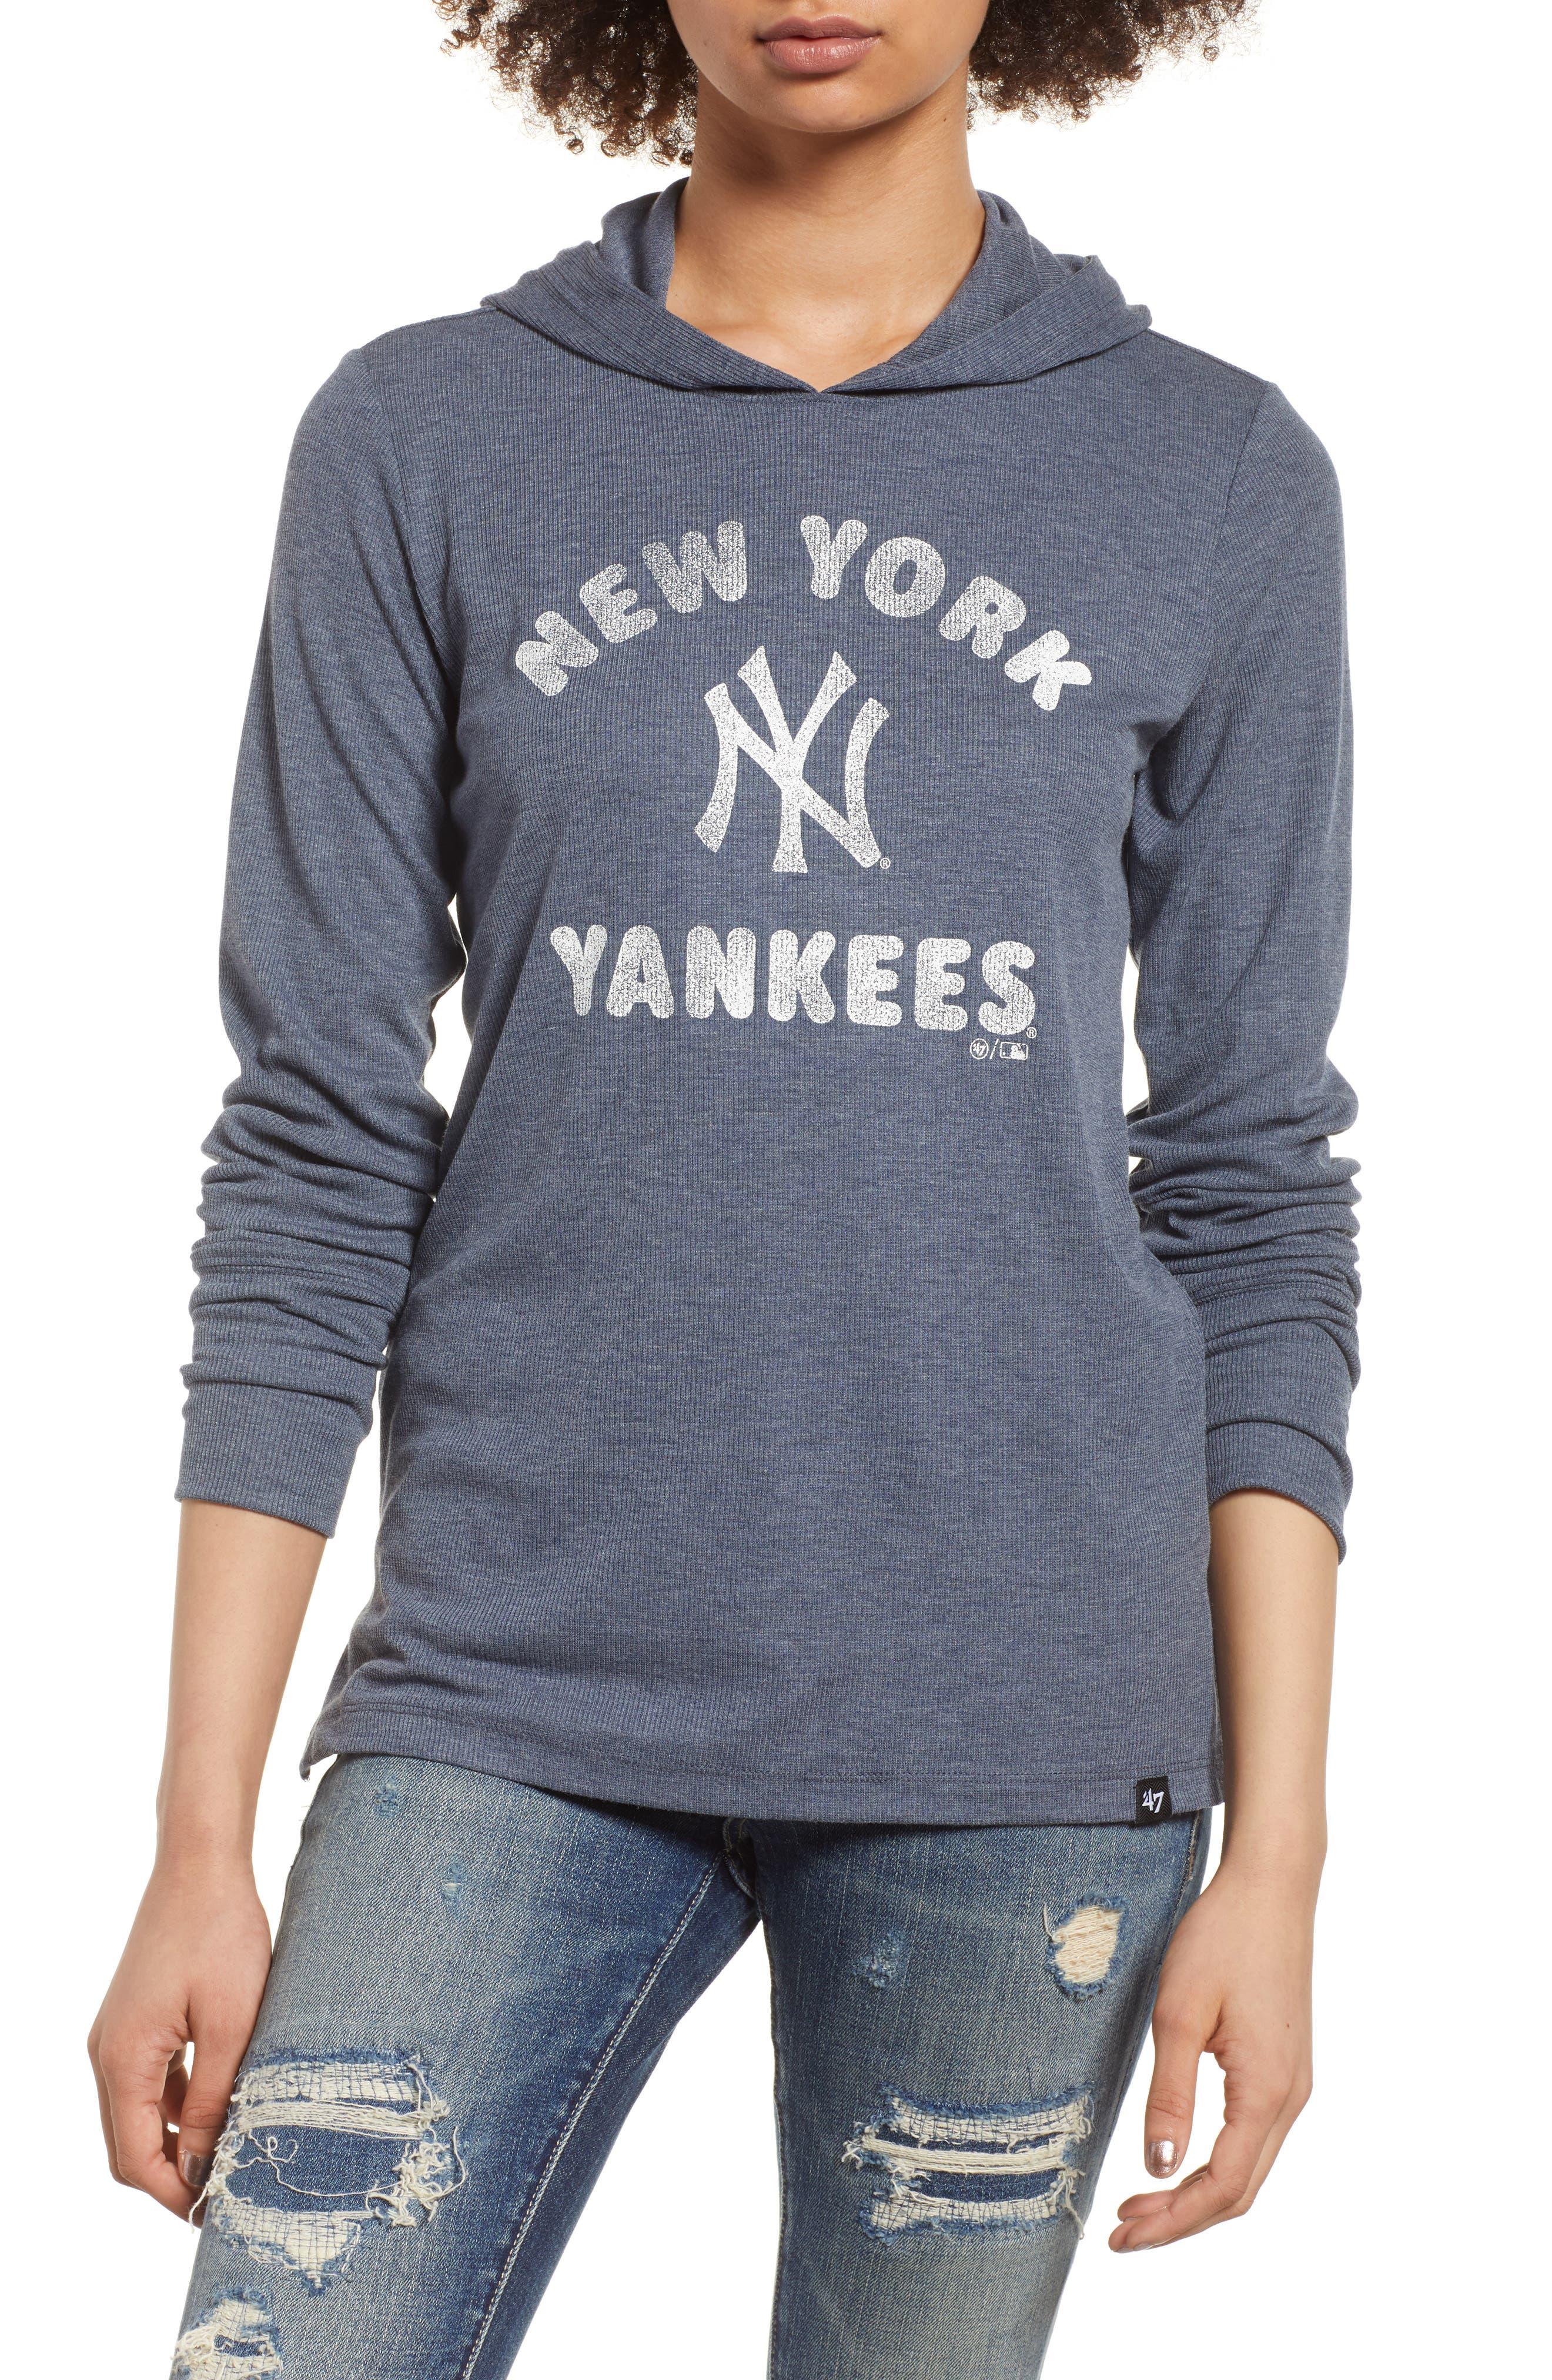 Campbell New York Yankees Rib Knit Hooded Top,                             Main thumbnail 1, color,                             Midnight